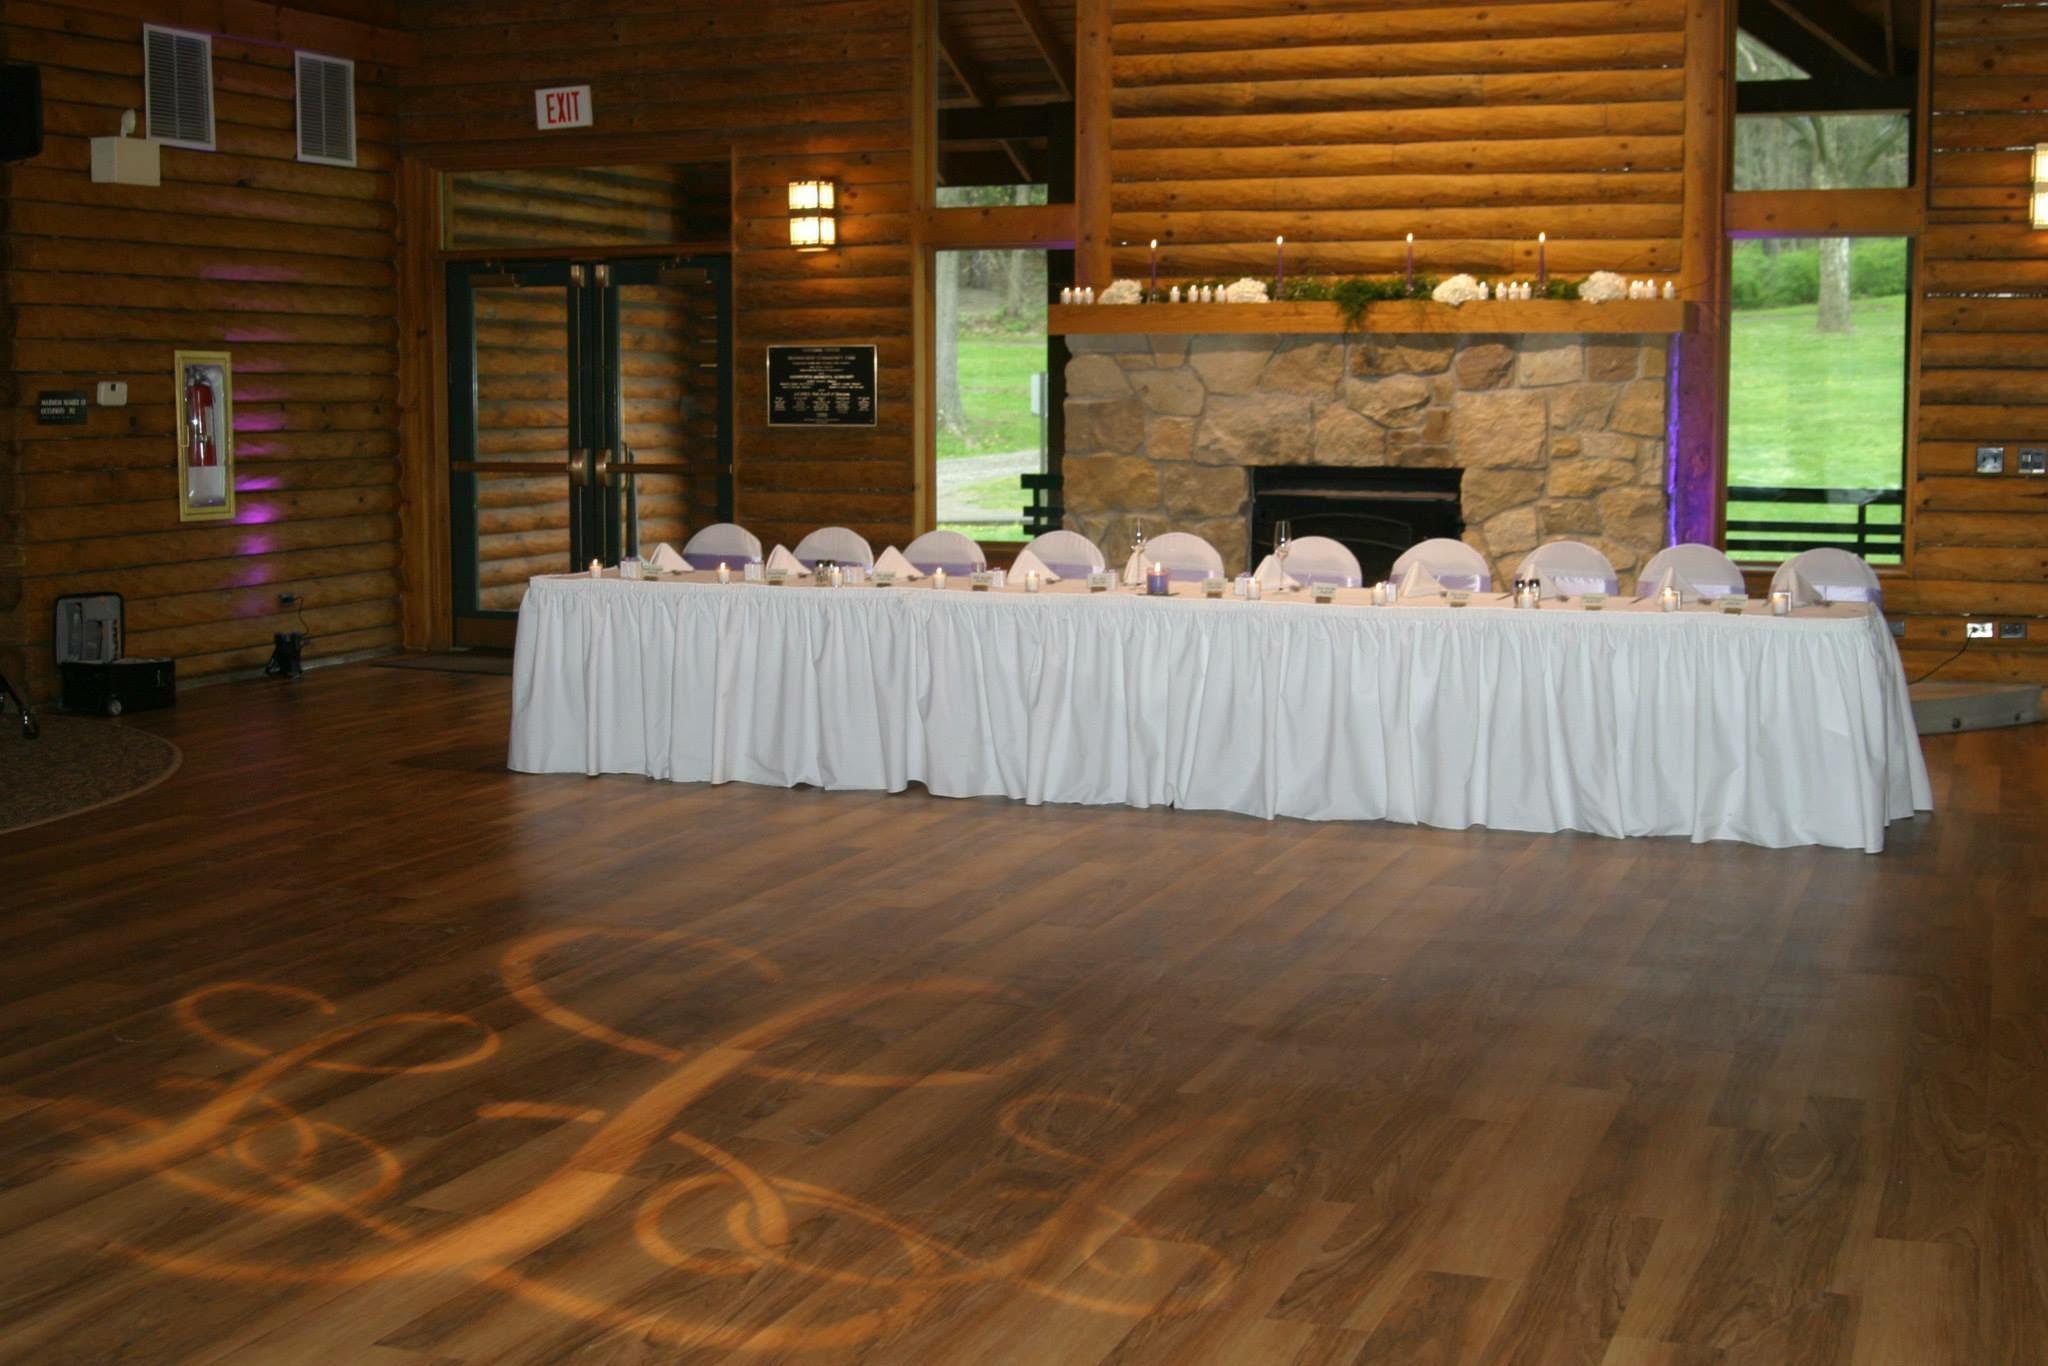 pa-barn-weddings-11.jpg